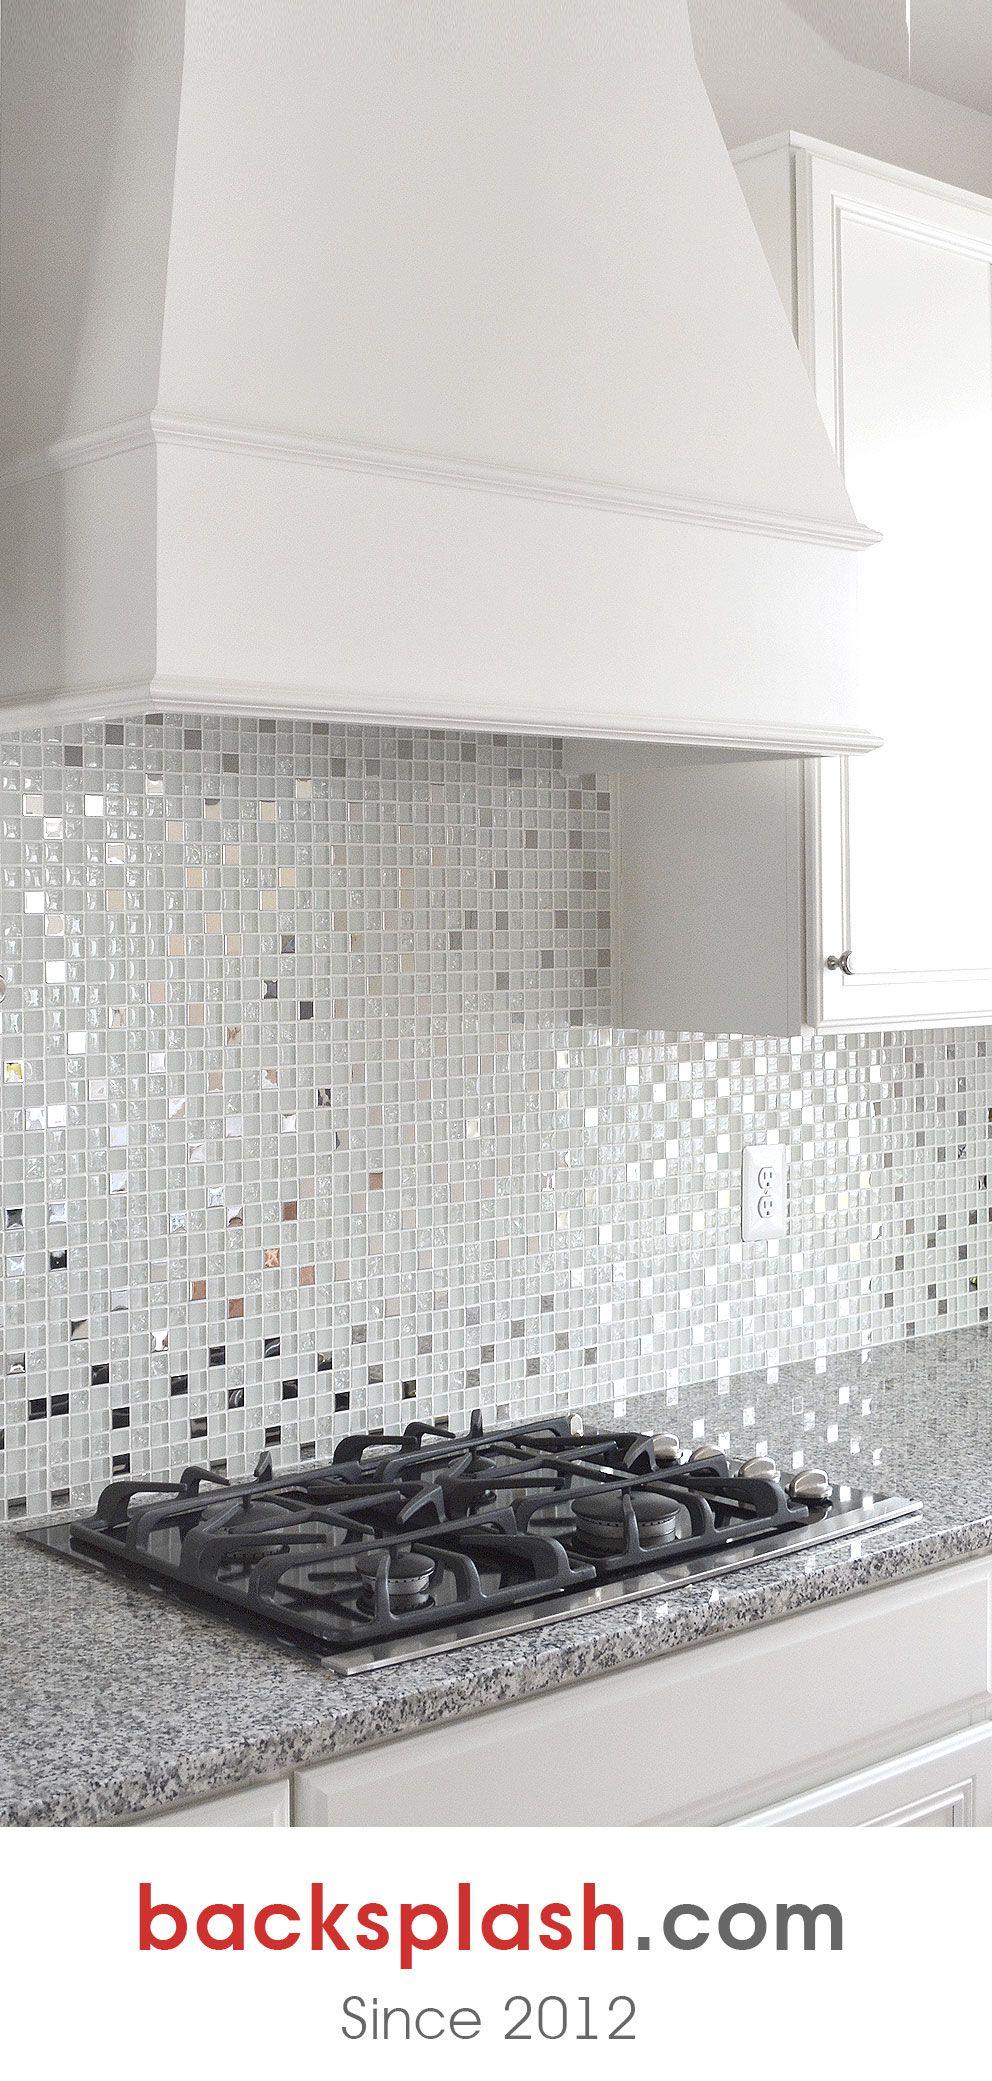 Modern White Glass Metal Kitchen Backsplash Tile Backsplash Com In 2021 Metal Backsplash Kitchen Tile Backsplash Modern Backsplash Kitchen backsplash tile white